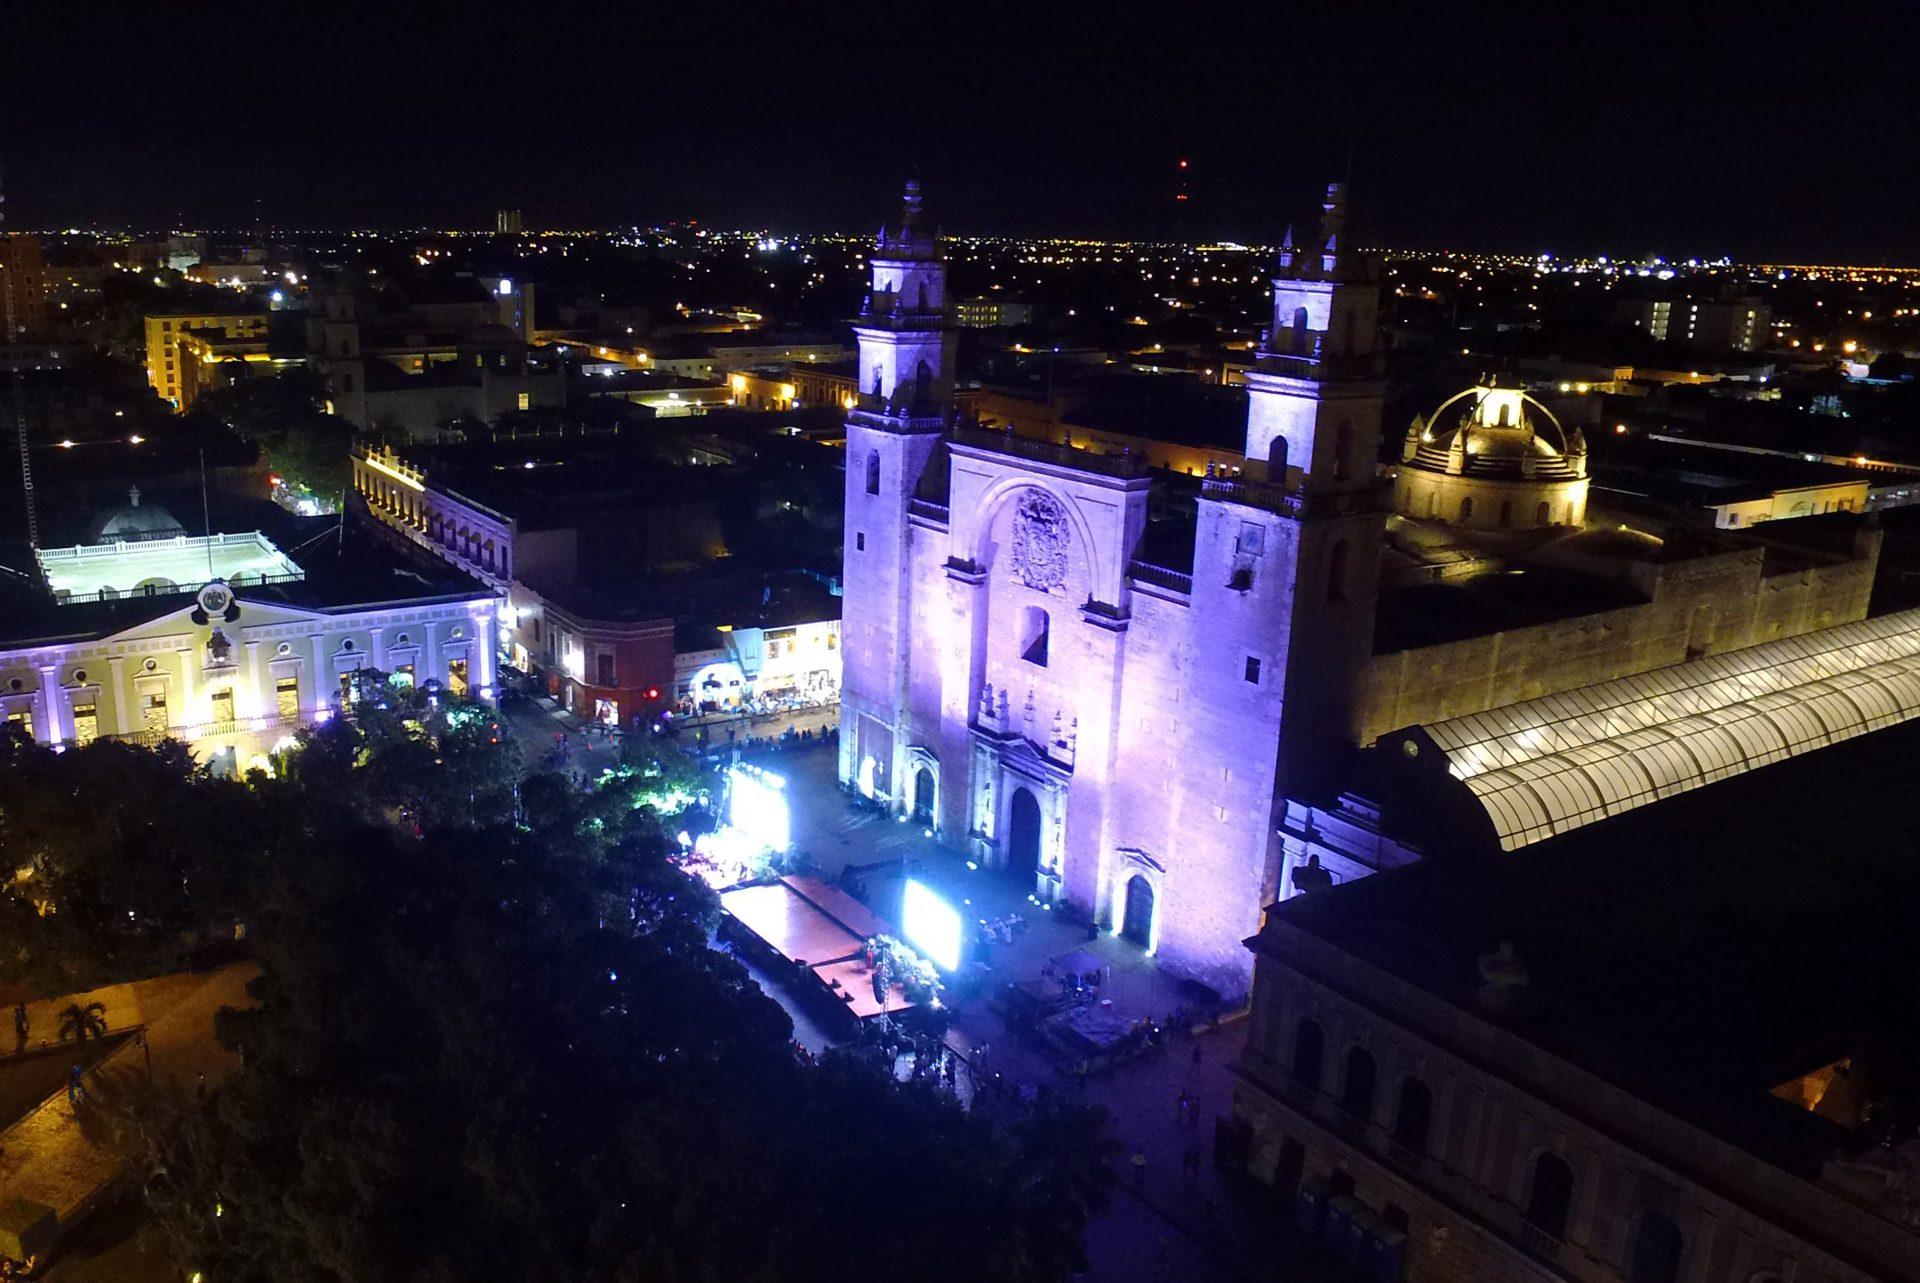 7 Tesoros del Patrimonio Cultural de Mérida